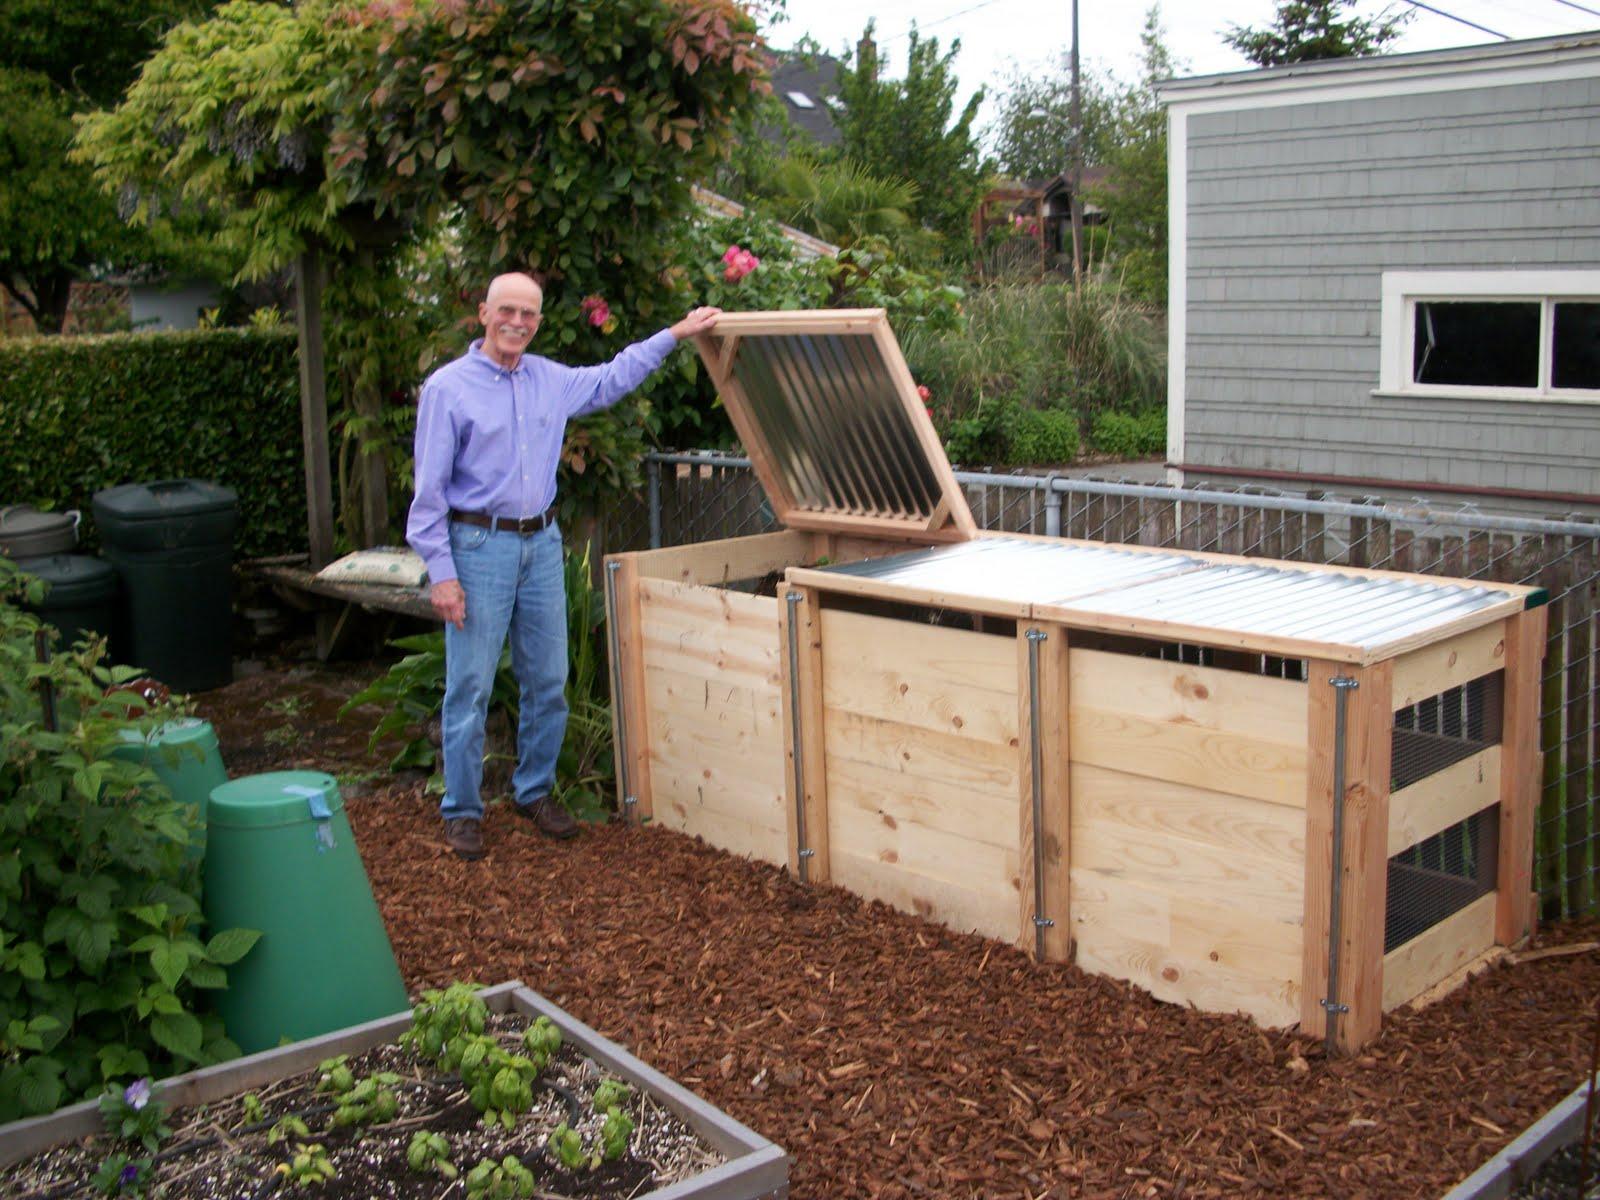 Backyard Bins the virtual world: new compost bins, virtual garden tour